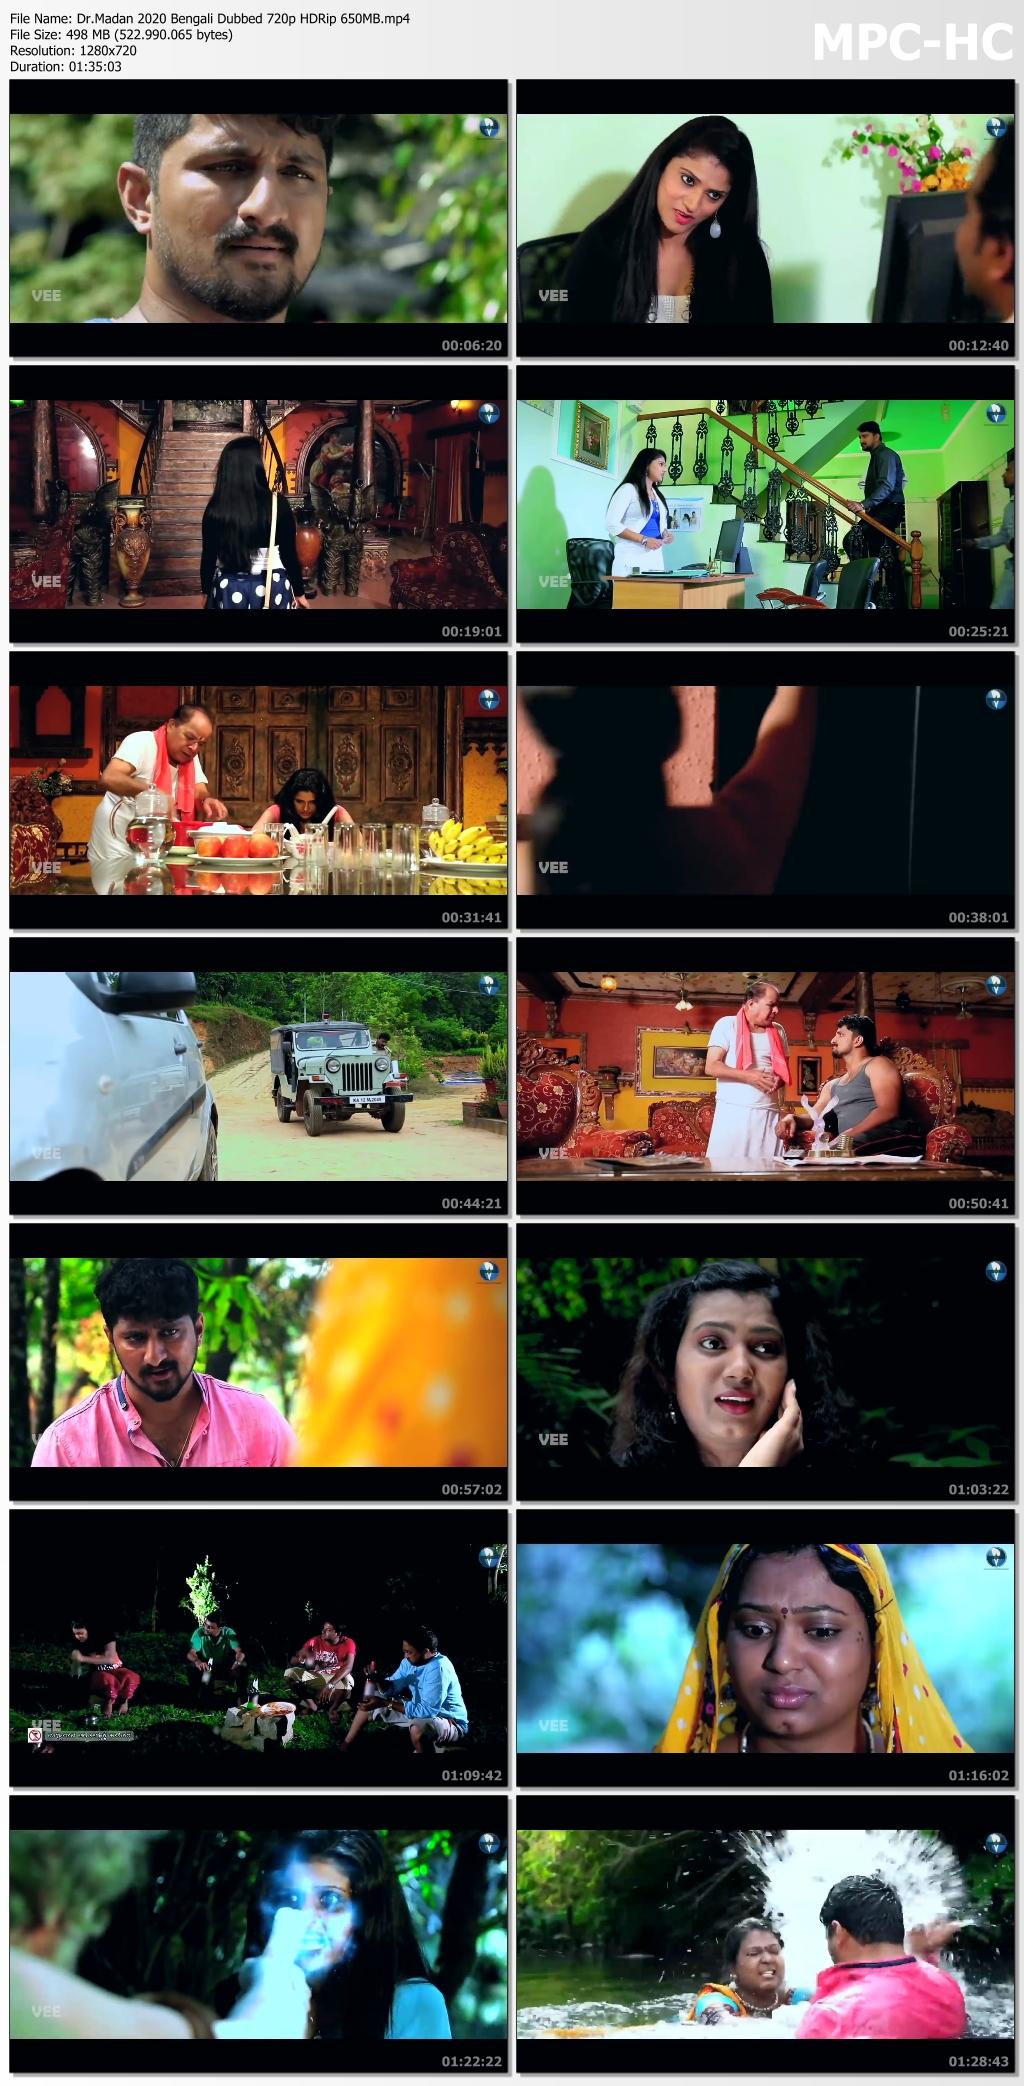 Dr-Madan-2020-Bengali-Dubbed-720p-HDRip-650-MB-mp4-thumbs